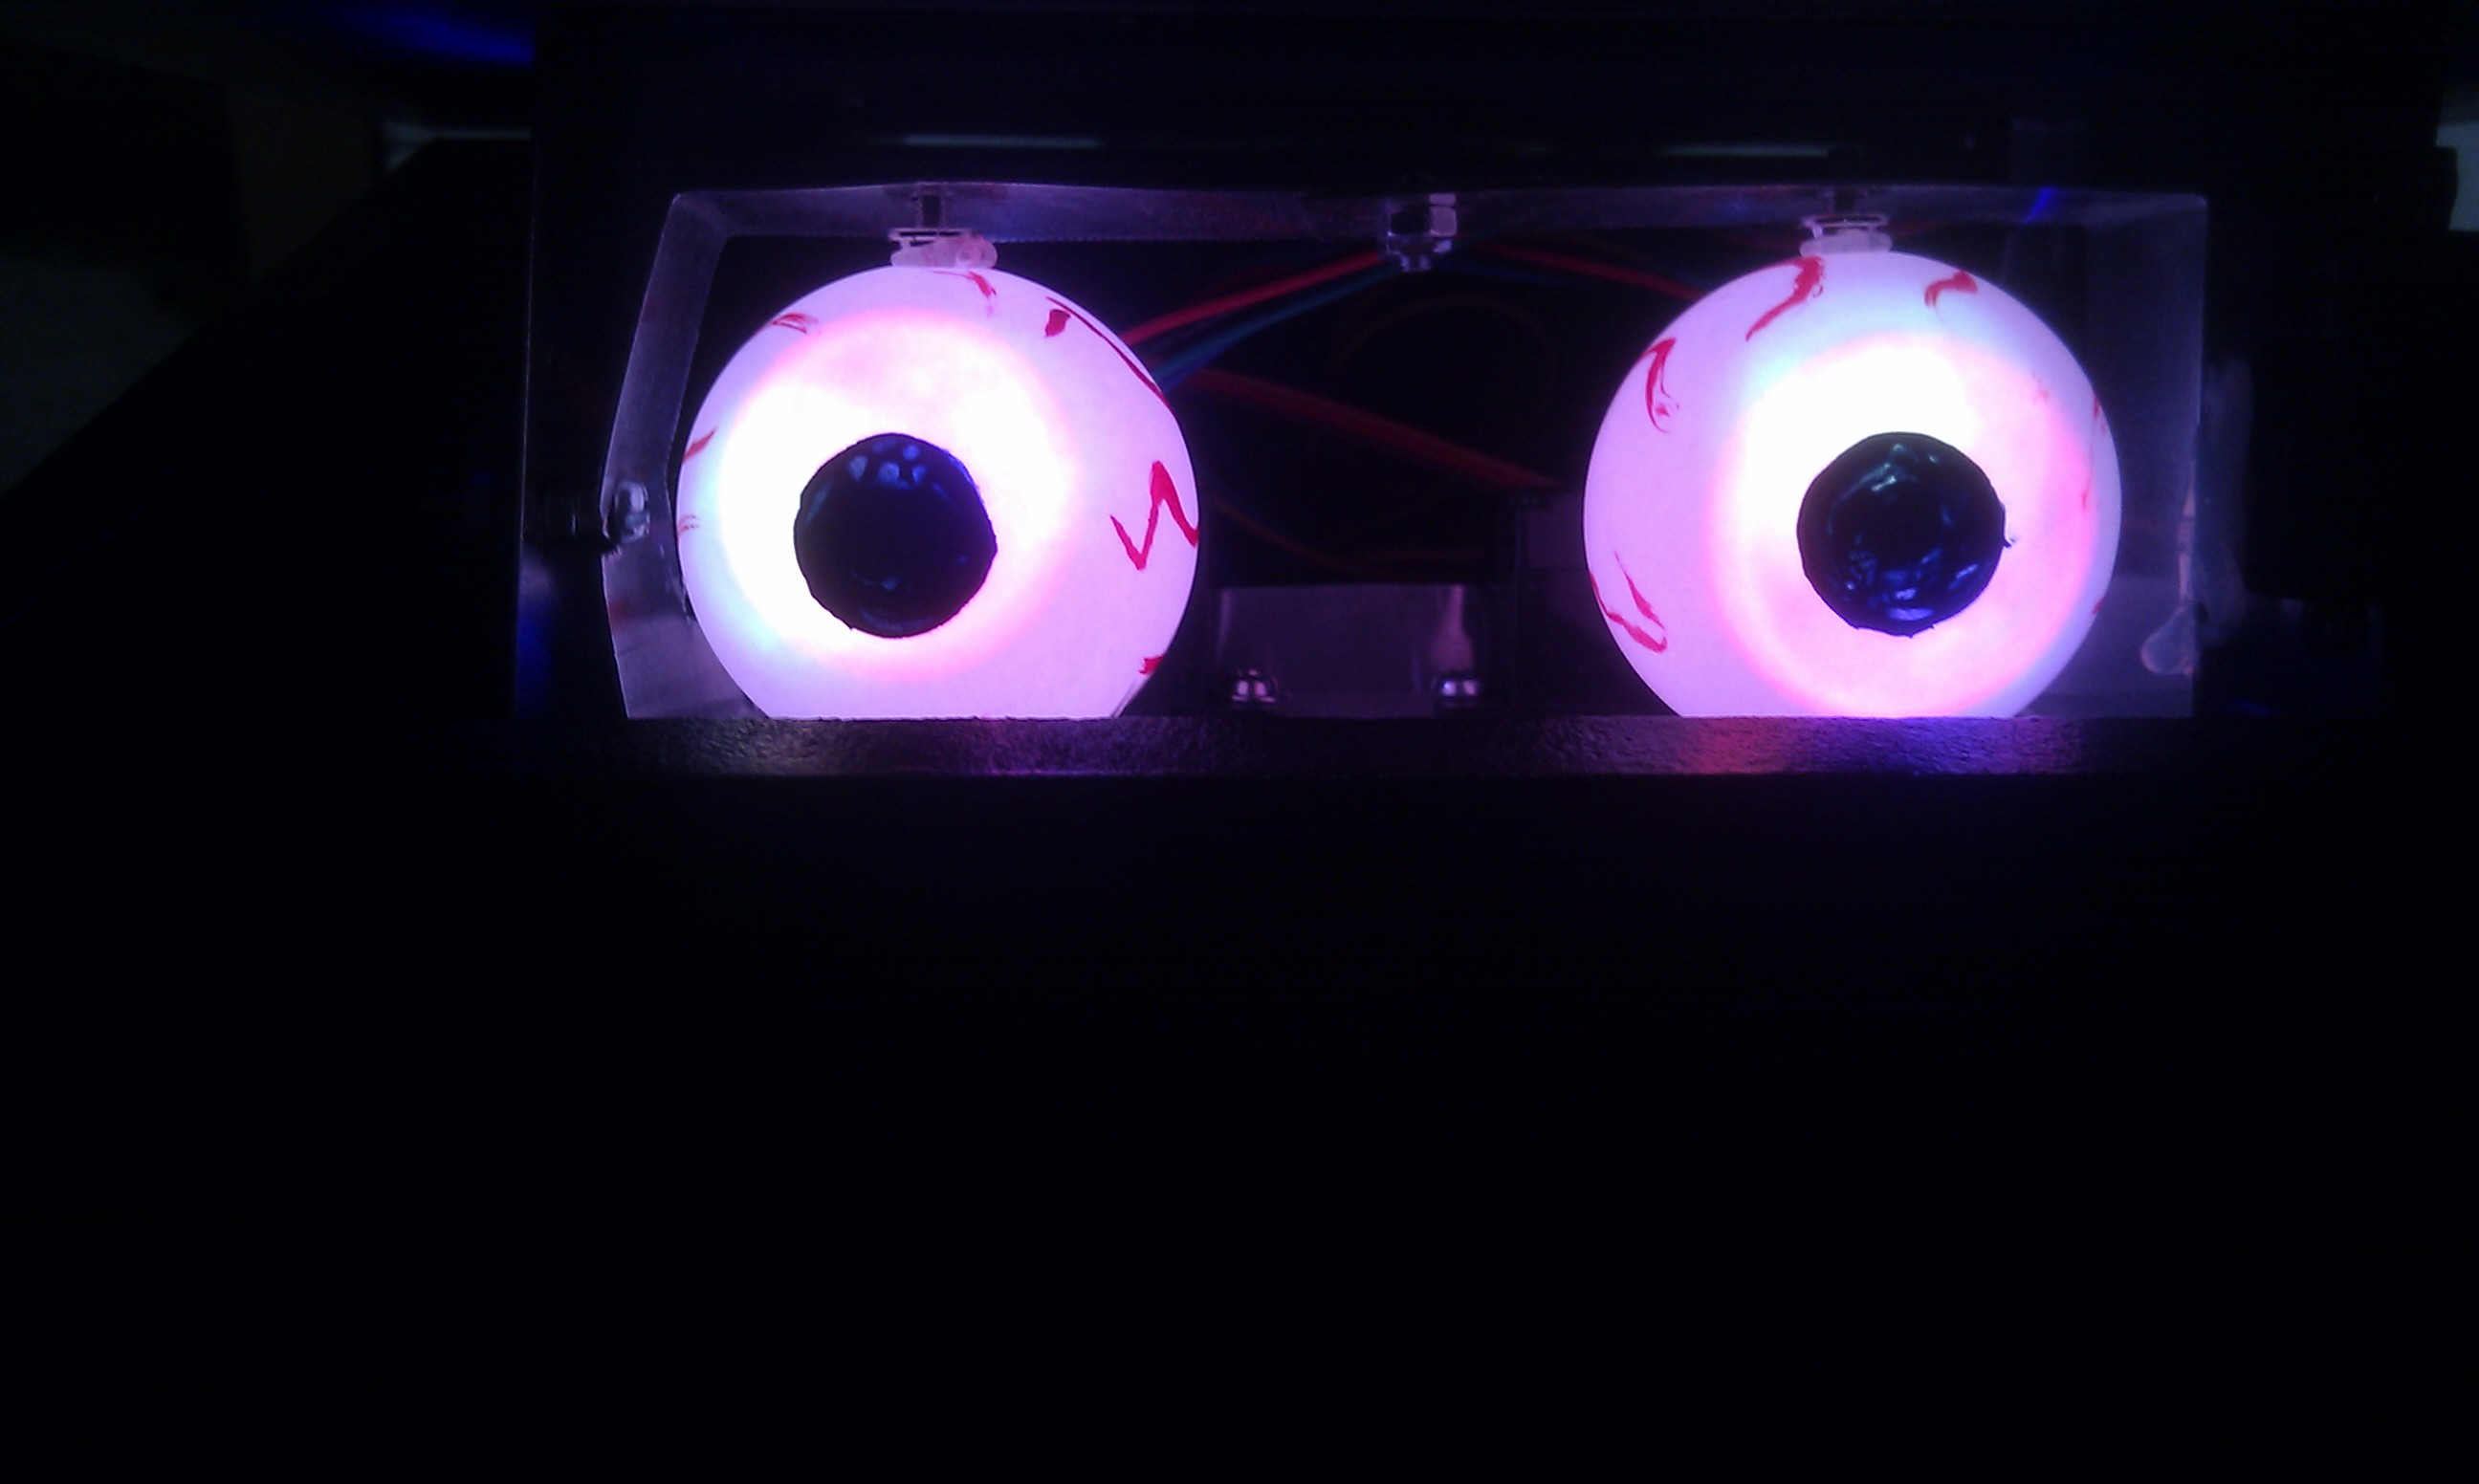 Eyes in a box